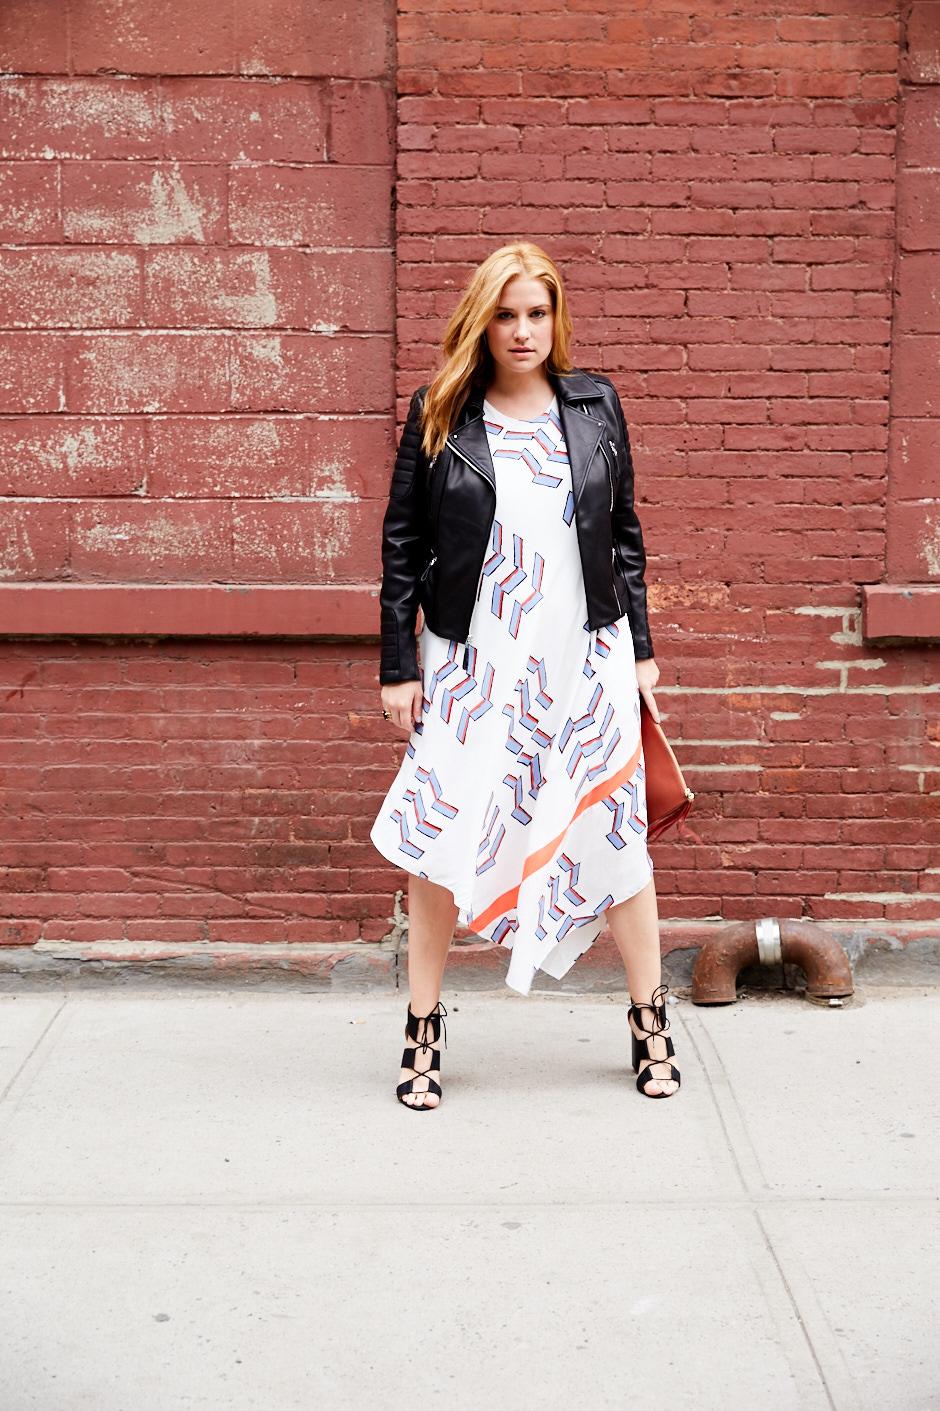 Xhilaration jacket, $39.99;  target.com . Rachel Rachel Roy dress, $69.99;  macys.com . LOFT heels, $89.50;  loft.com . Vince Camuto clutch, $148;  vincecamuto.com .